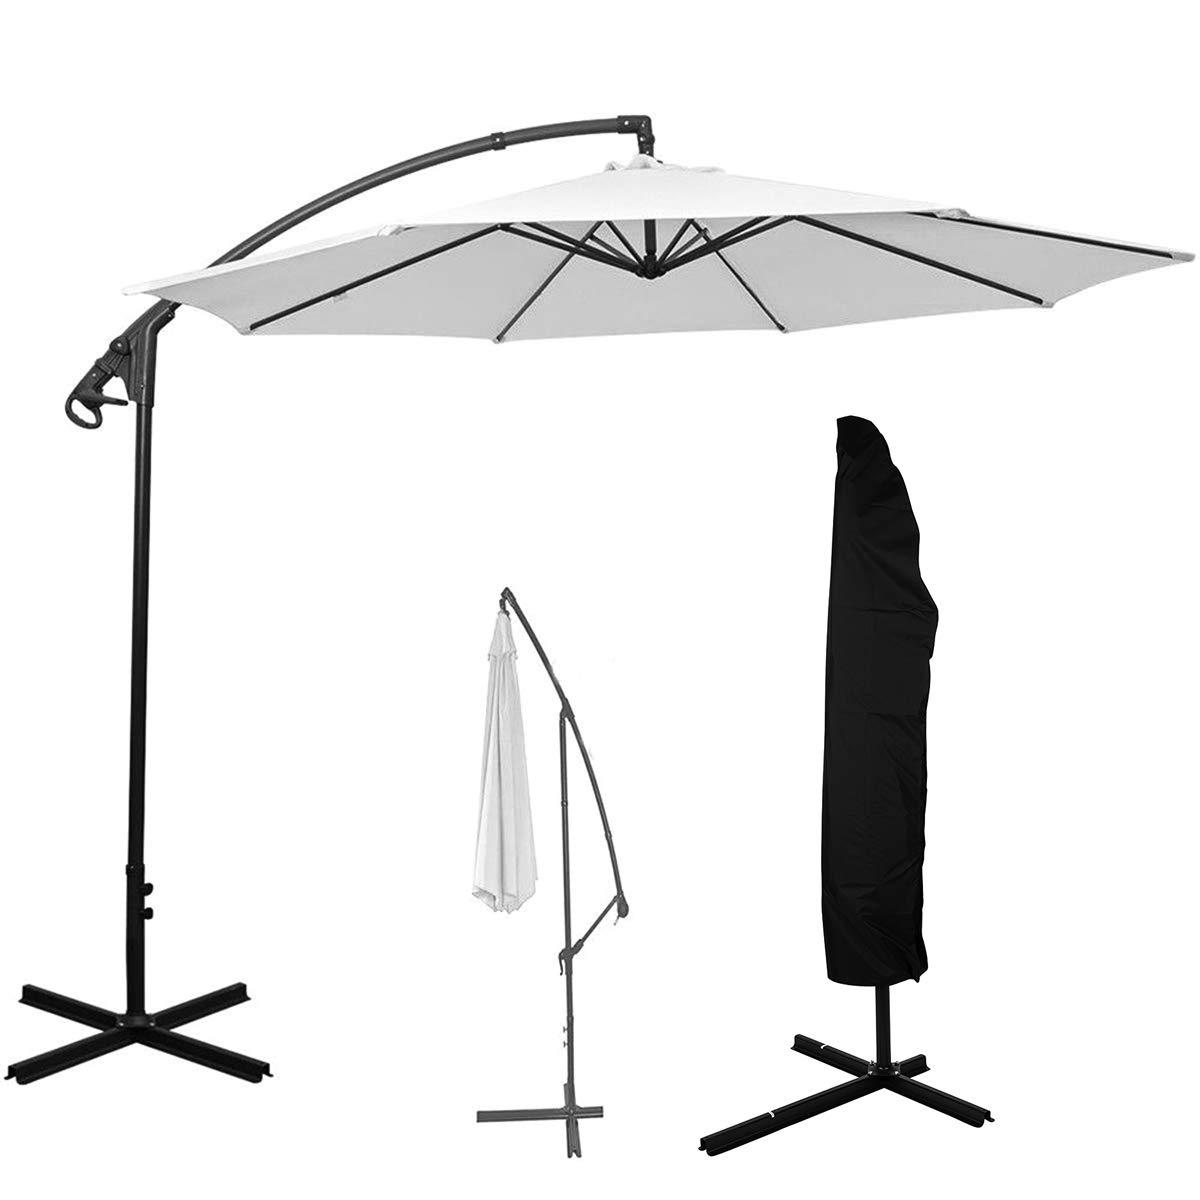 Yudanny Oxford Waterproof Cantilever Parasol Umbrella Cover Garden Patio Furniture Case Ship from UK